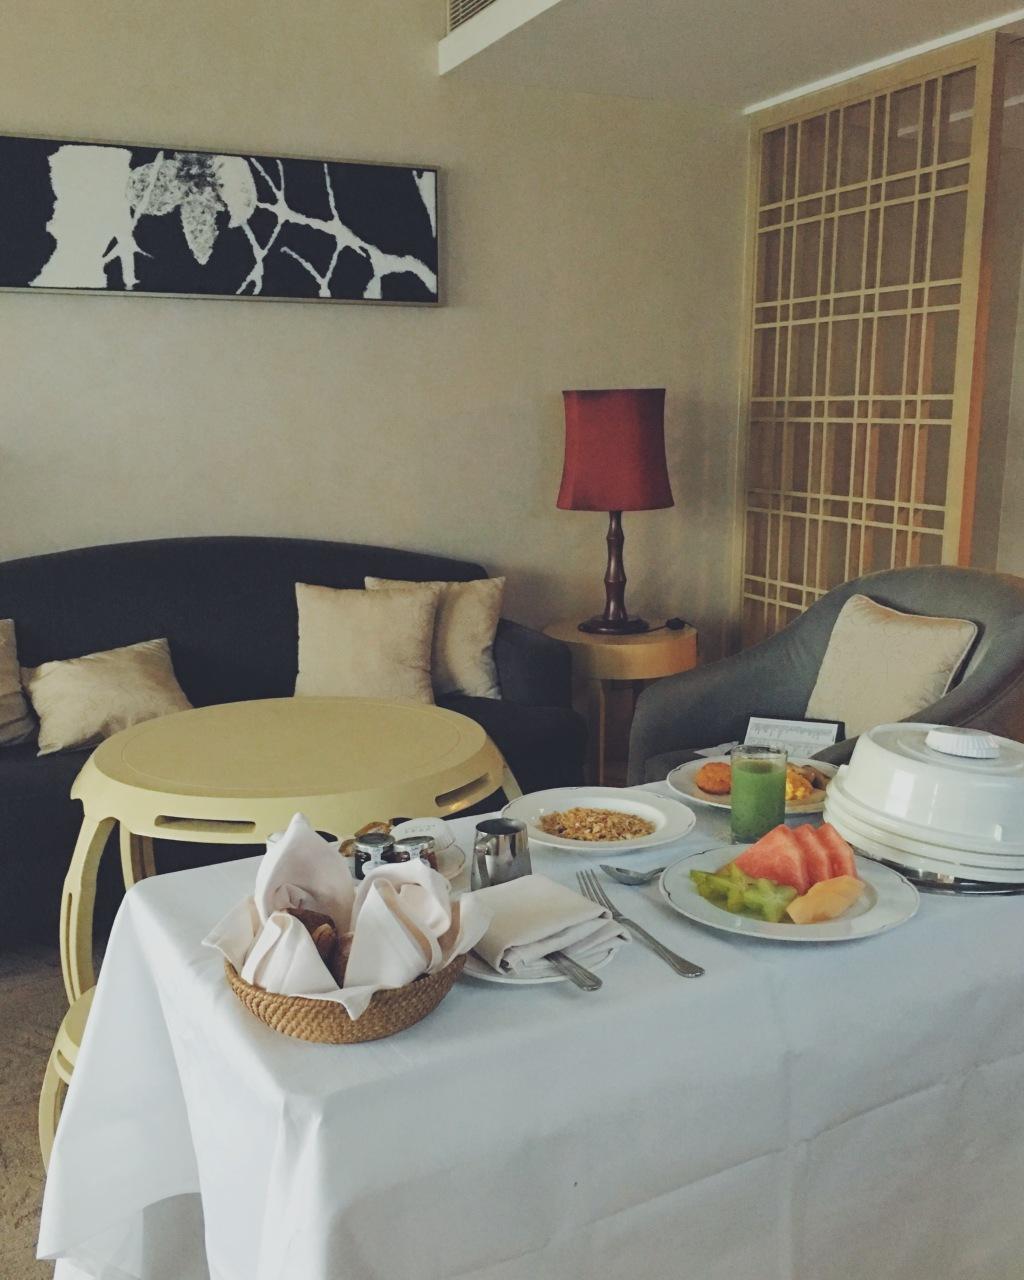 Garden Hotel room service breakfast